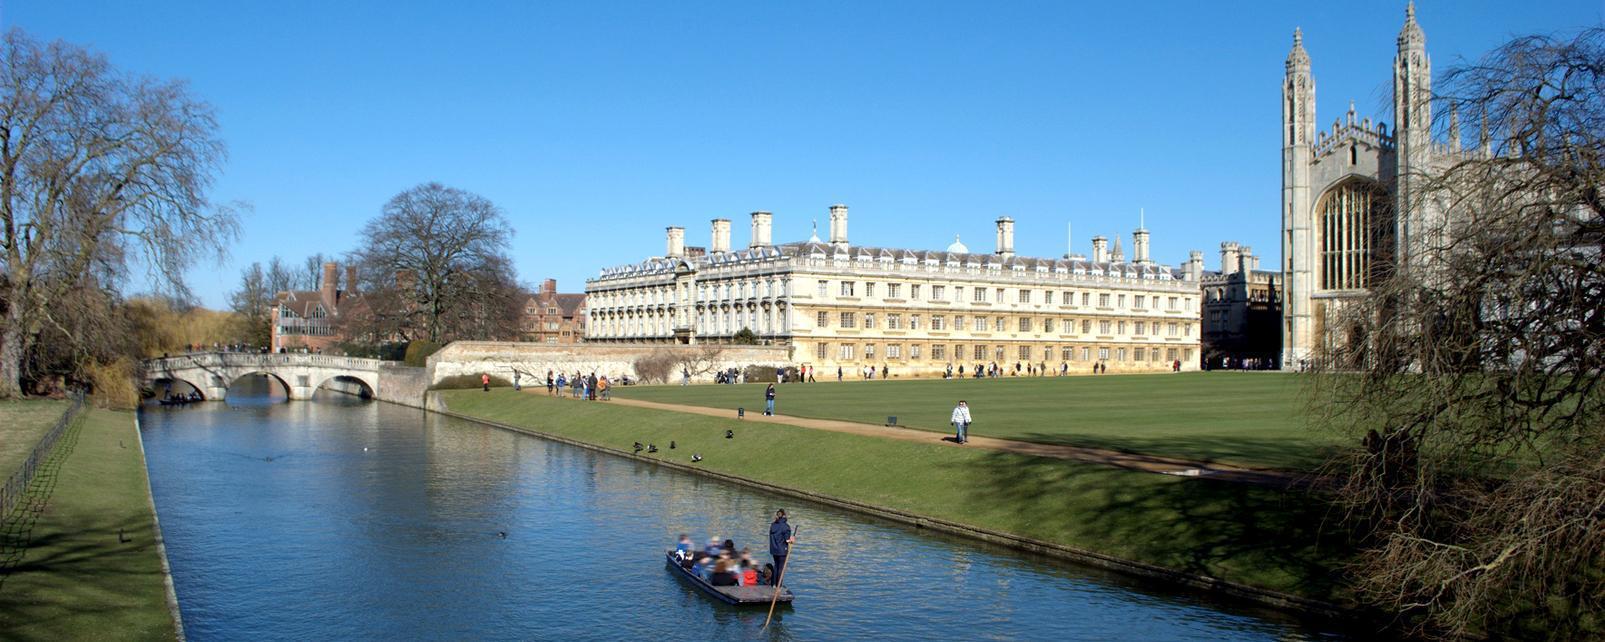 Europe; Royaume-Uni; Angleterre; Cambridge;